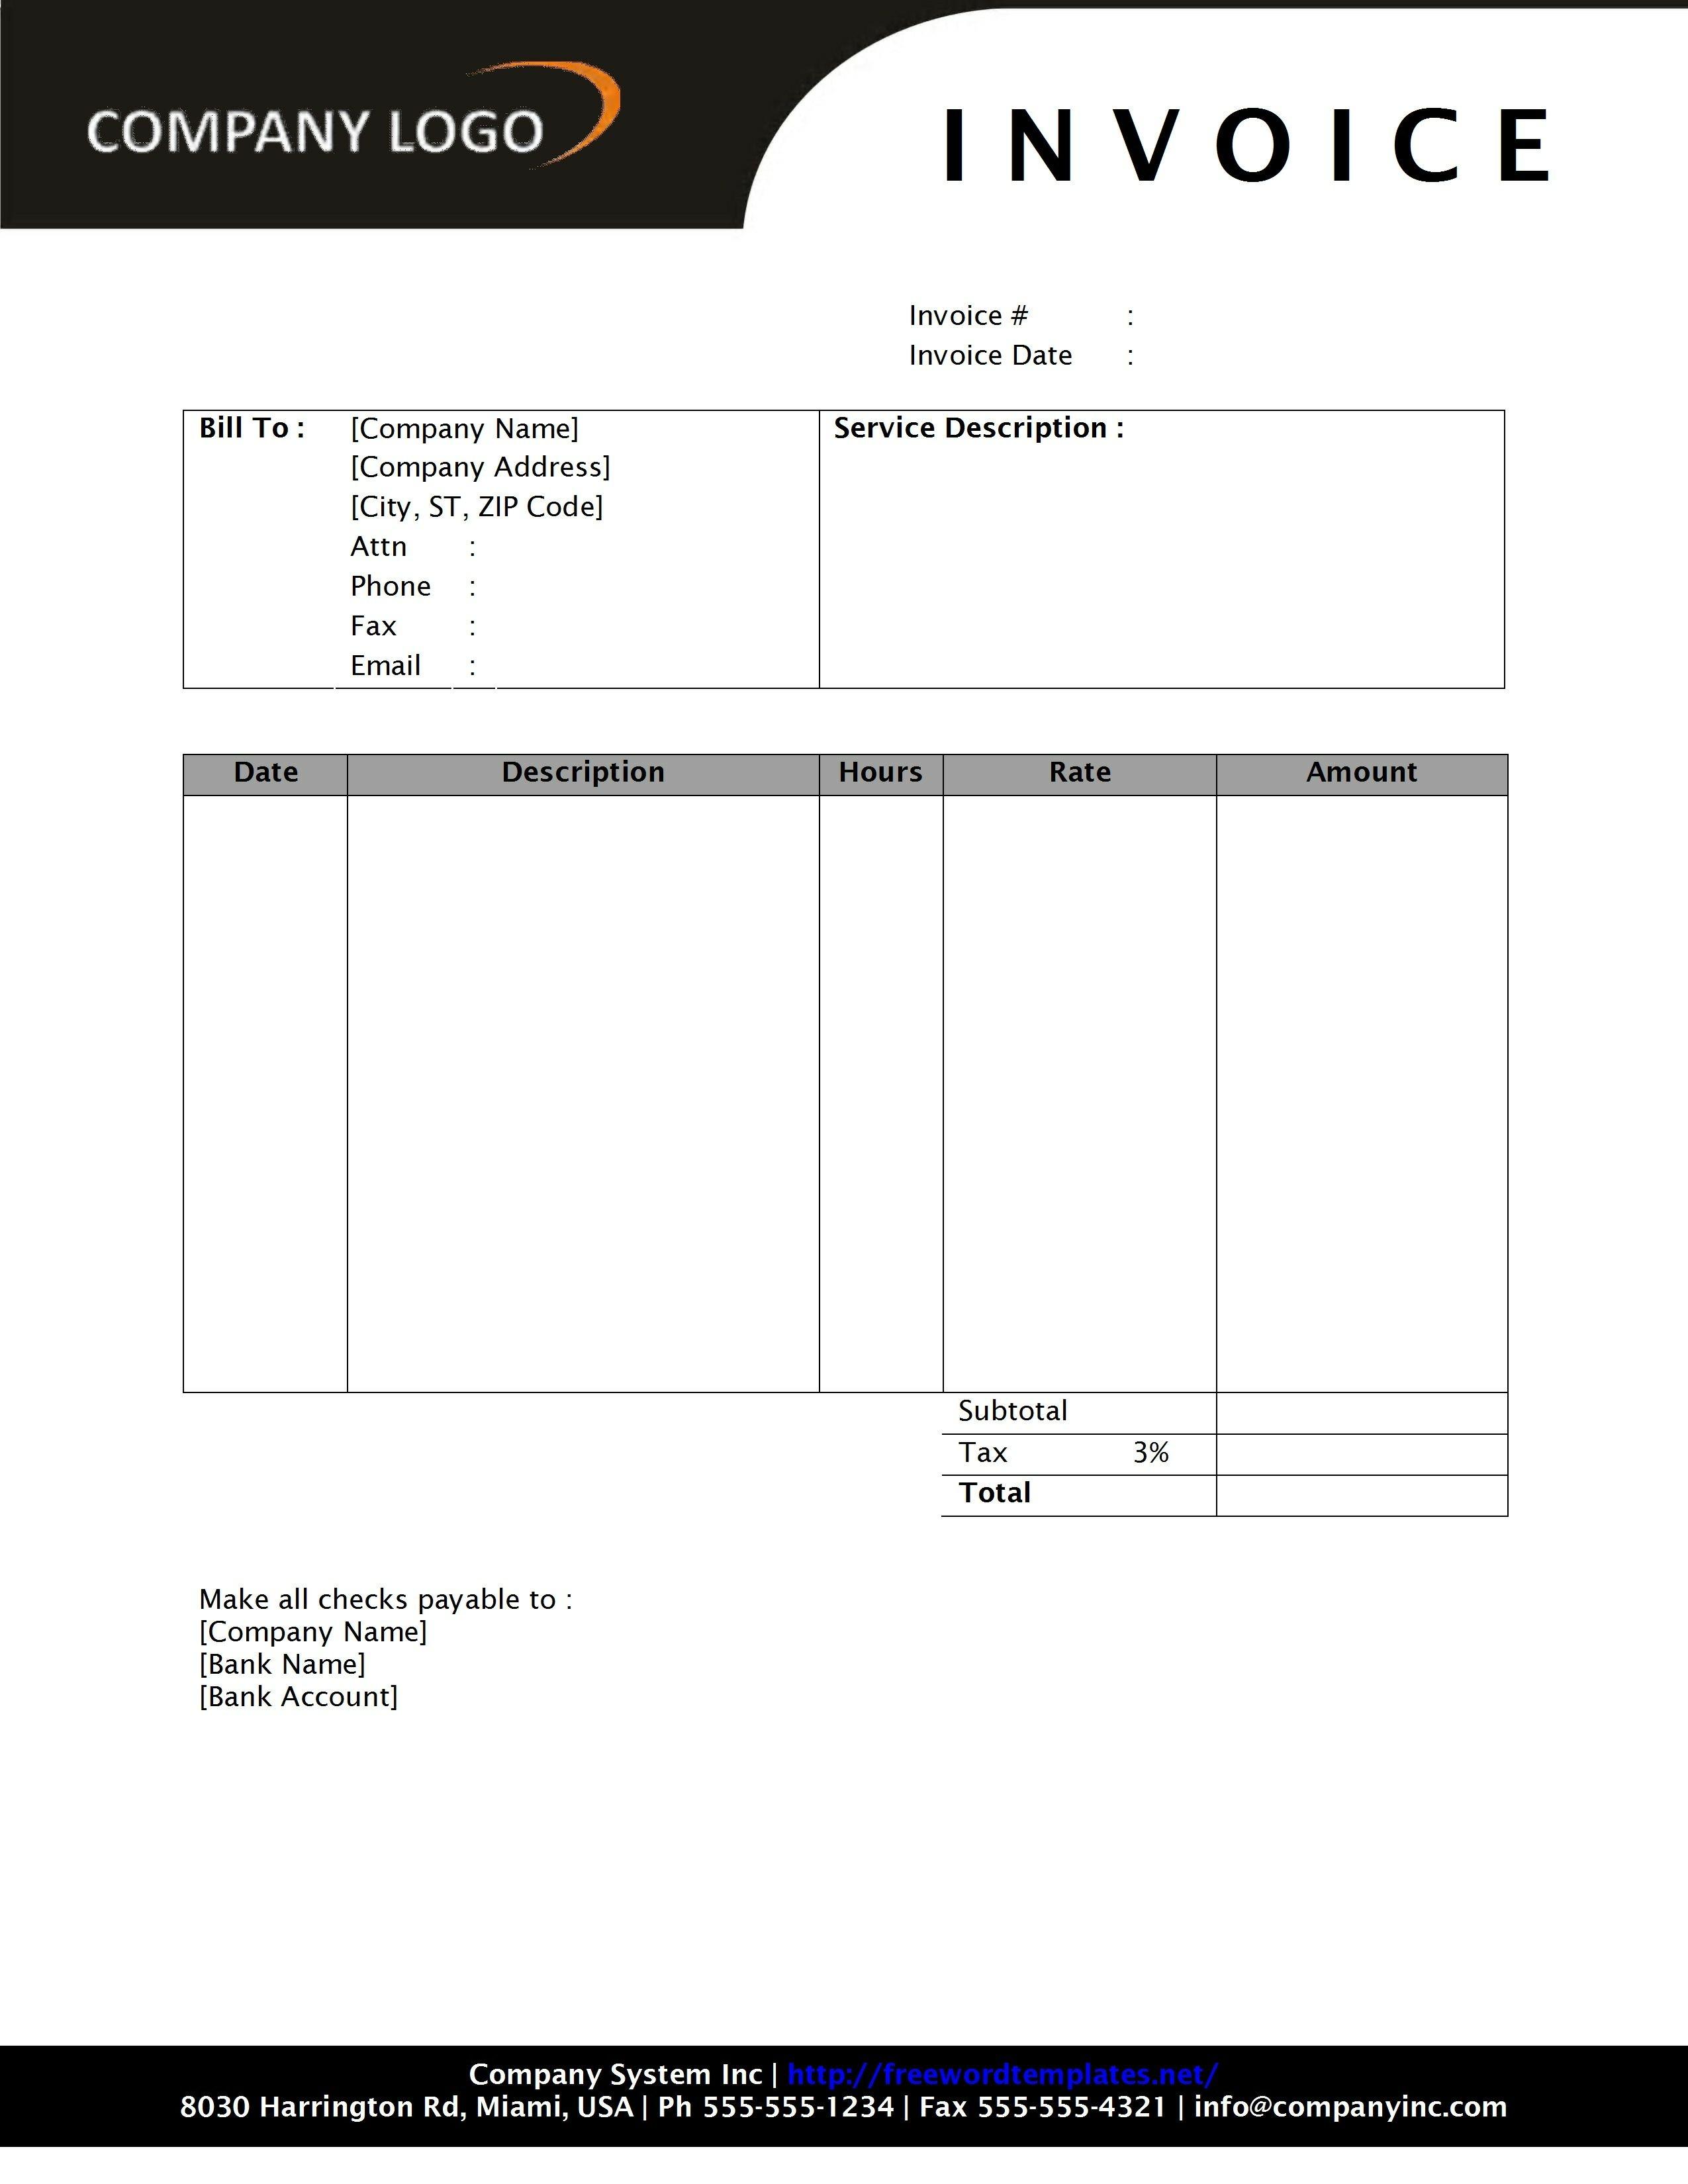 invoice collection service best ms word invoice templatemyshost myshost 2550 X 3300